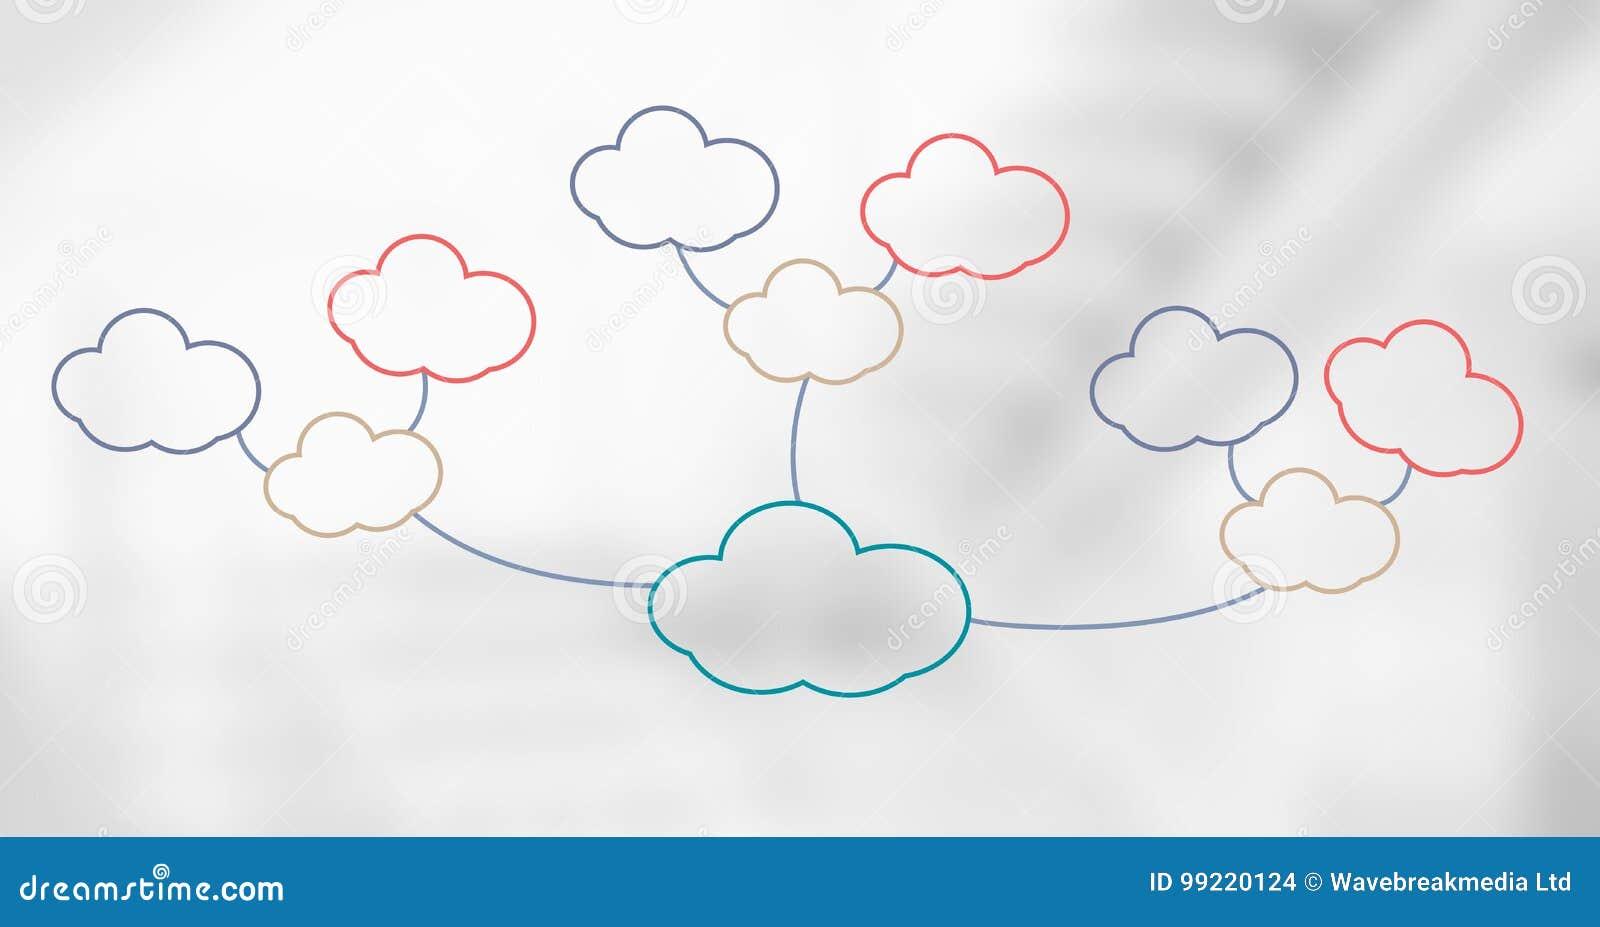 Mind Map Clouds Stock Illustrations – 35 Mind Map Clouds ... Cloud Mind Map on cloud world map, cloud activity map, cloud mind art, cloud value map, creating a concept map, cloud word map, printable concept map, cloud concept,